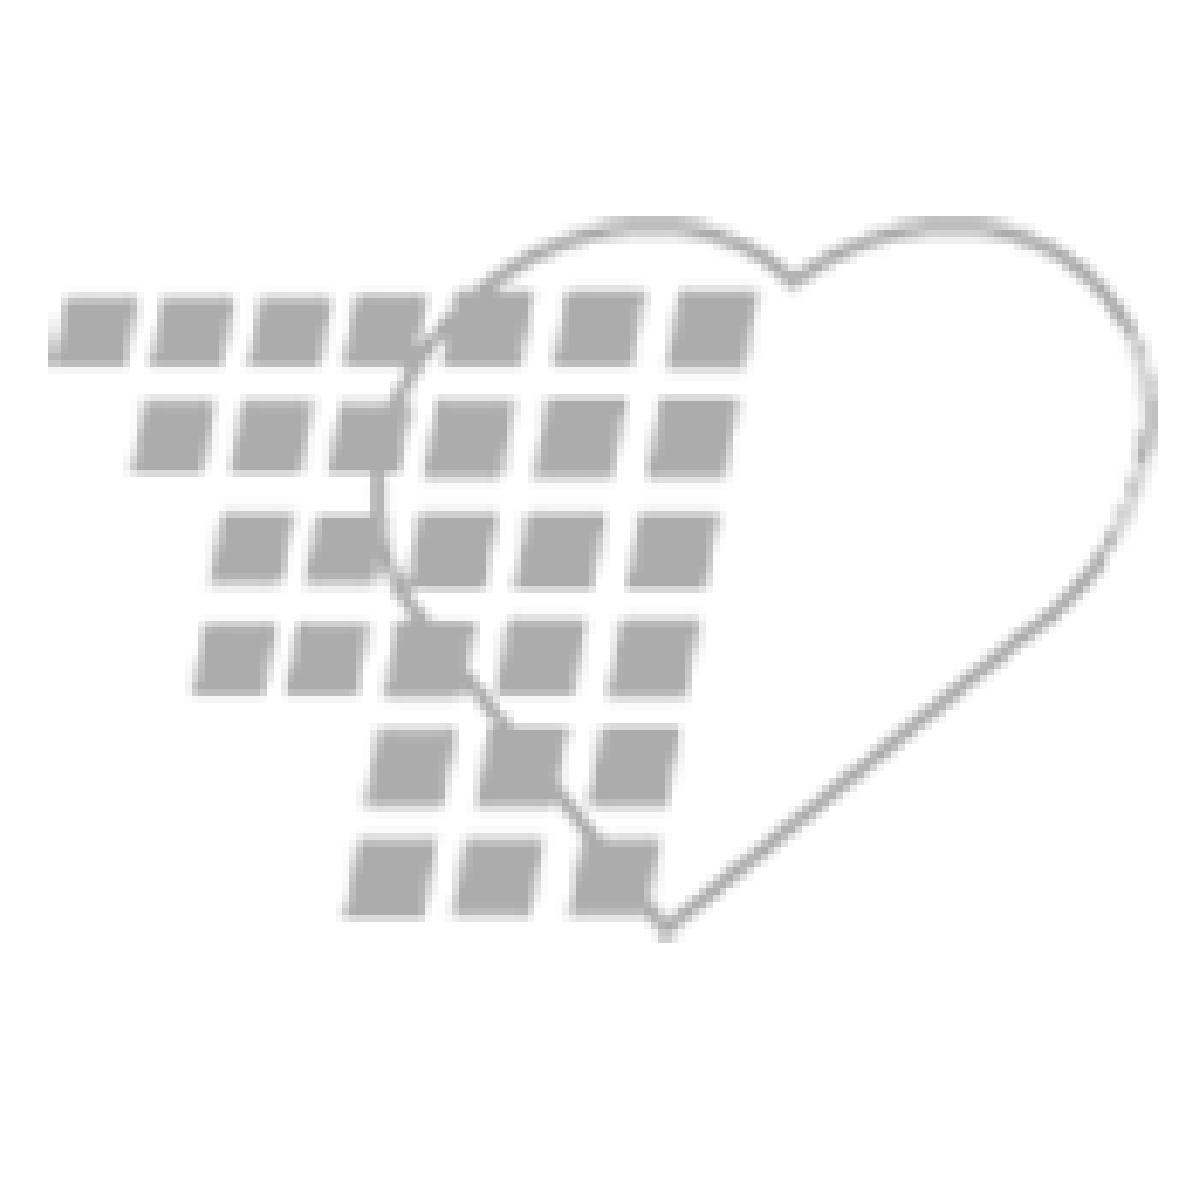 06-93-0038 - Demo Dose® Rifadn 150 mg - 100 Pills/Box